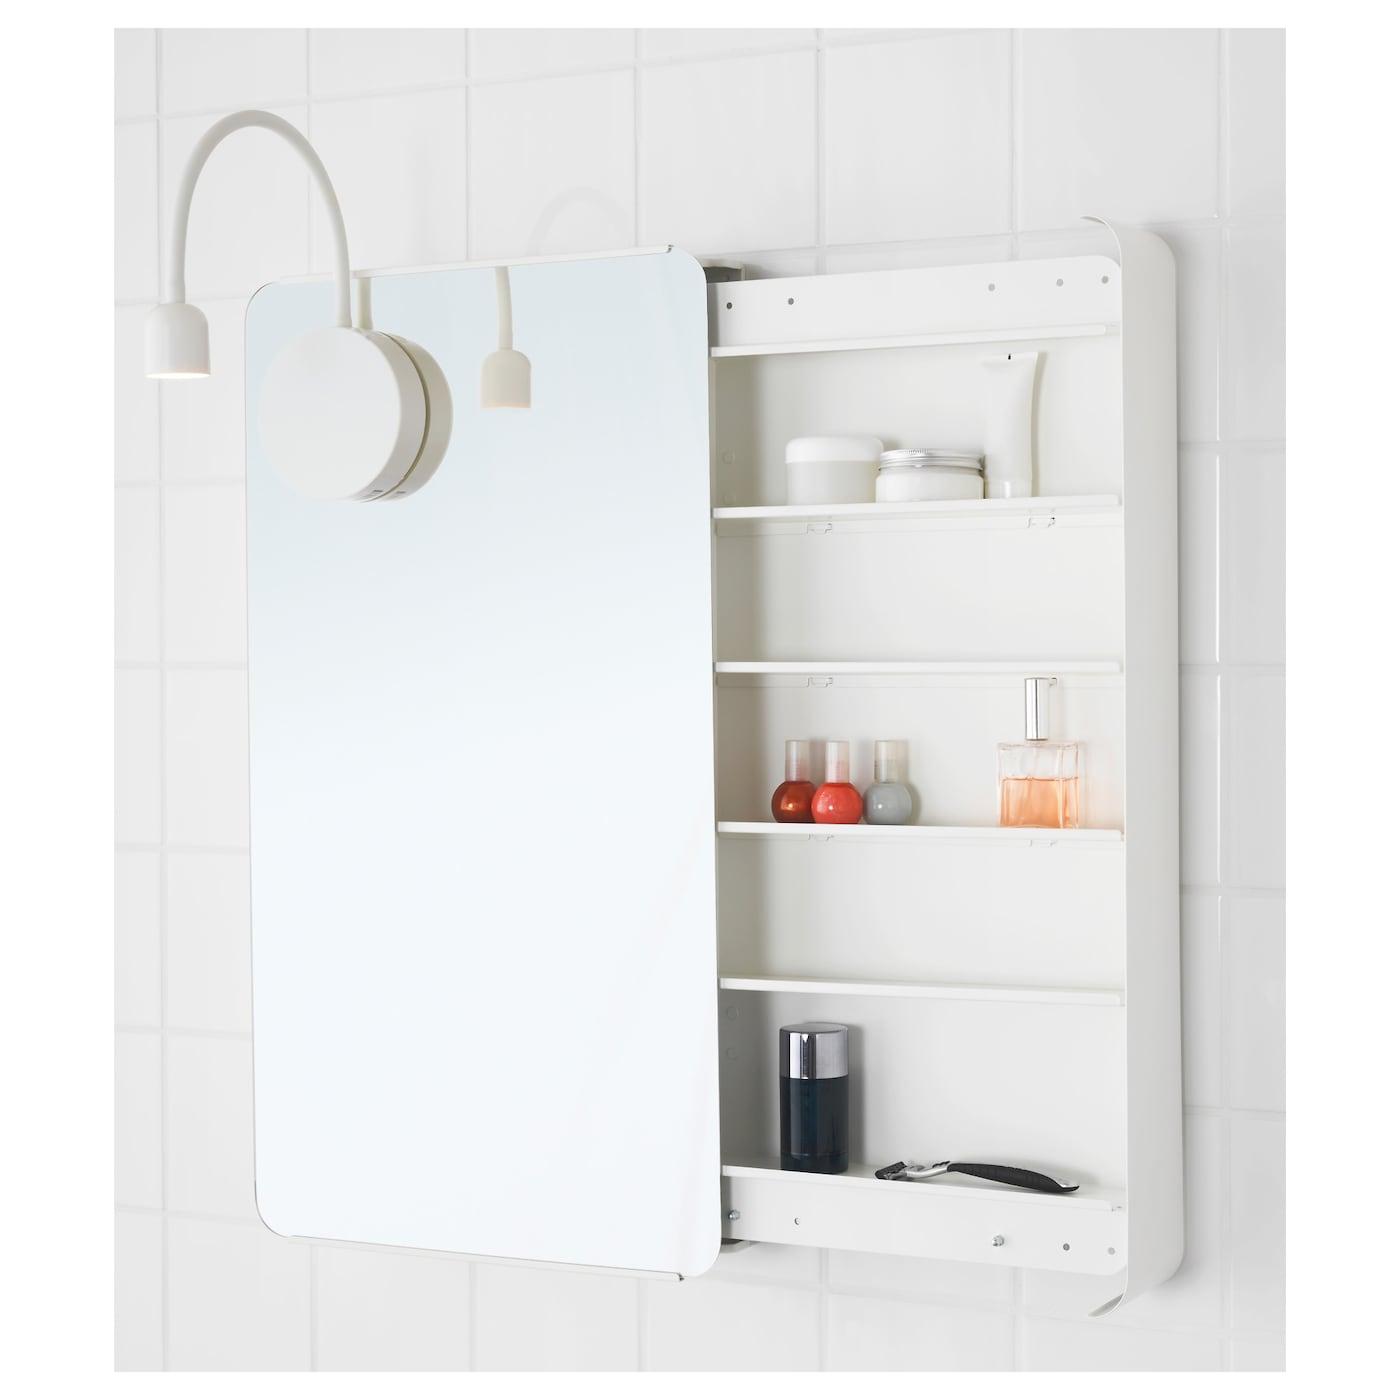 Brickan meuble avec miroir blanc 40x73 cm ikea for Meuble miroir ikea